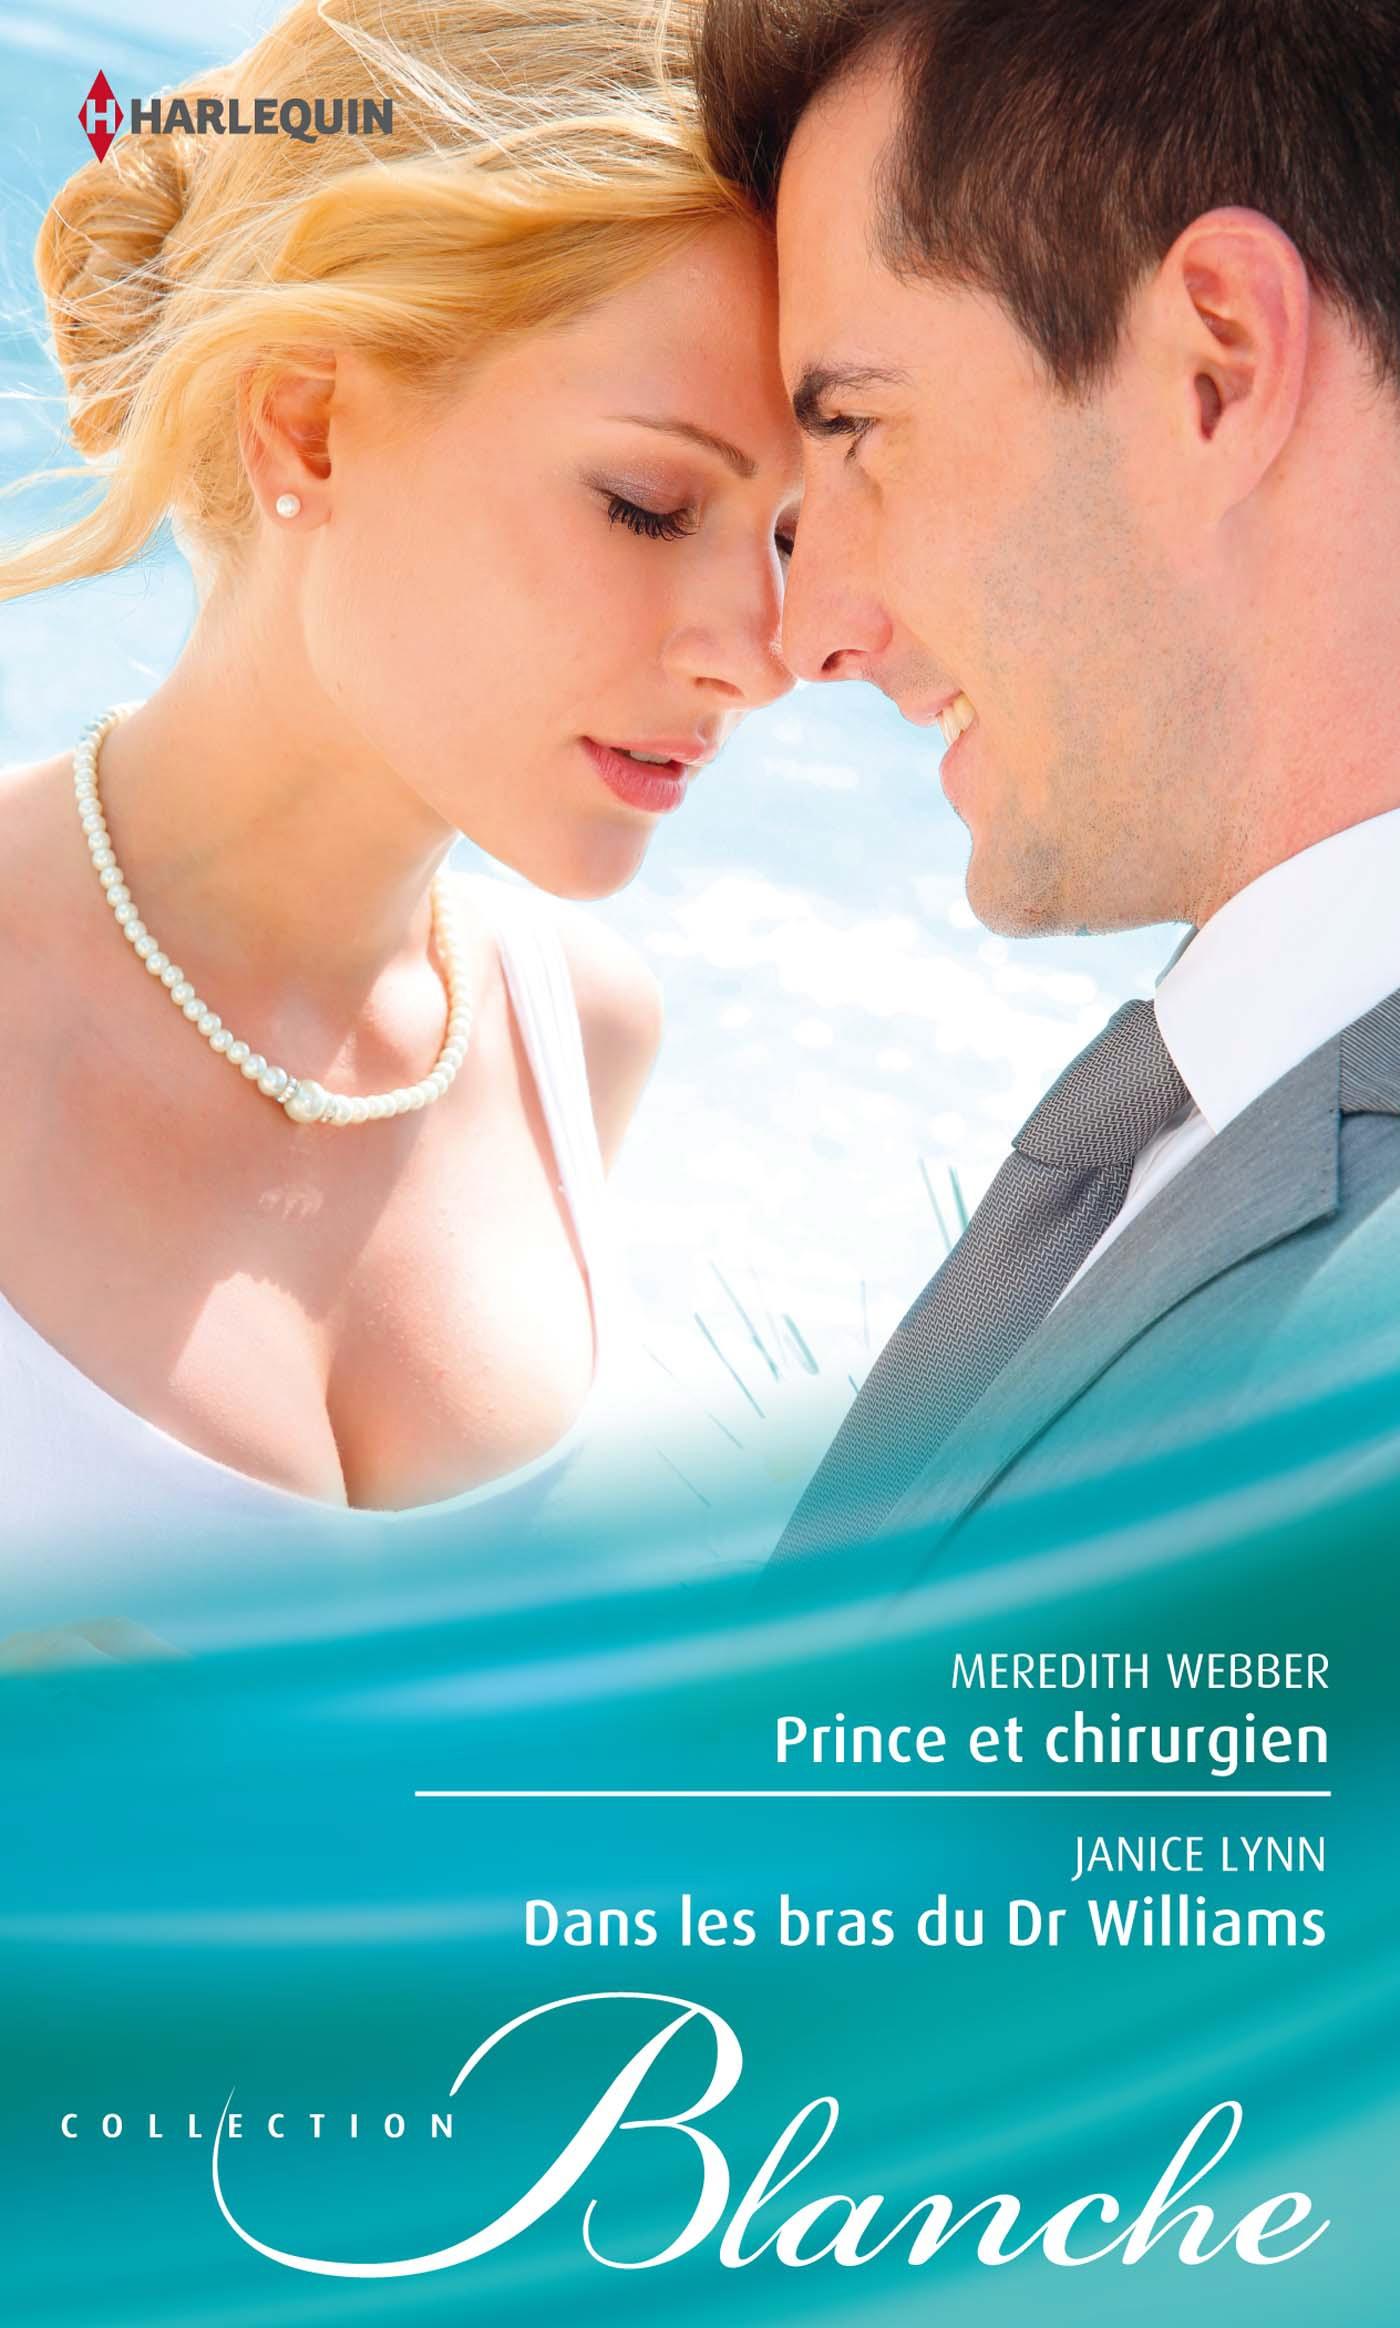 www.harlequin.fr/images/Livre-Hachette/HD/9782280310086.jpg